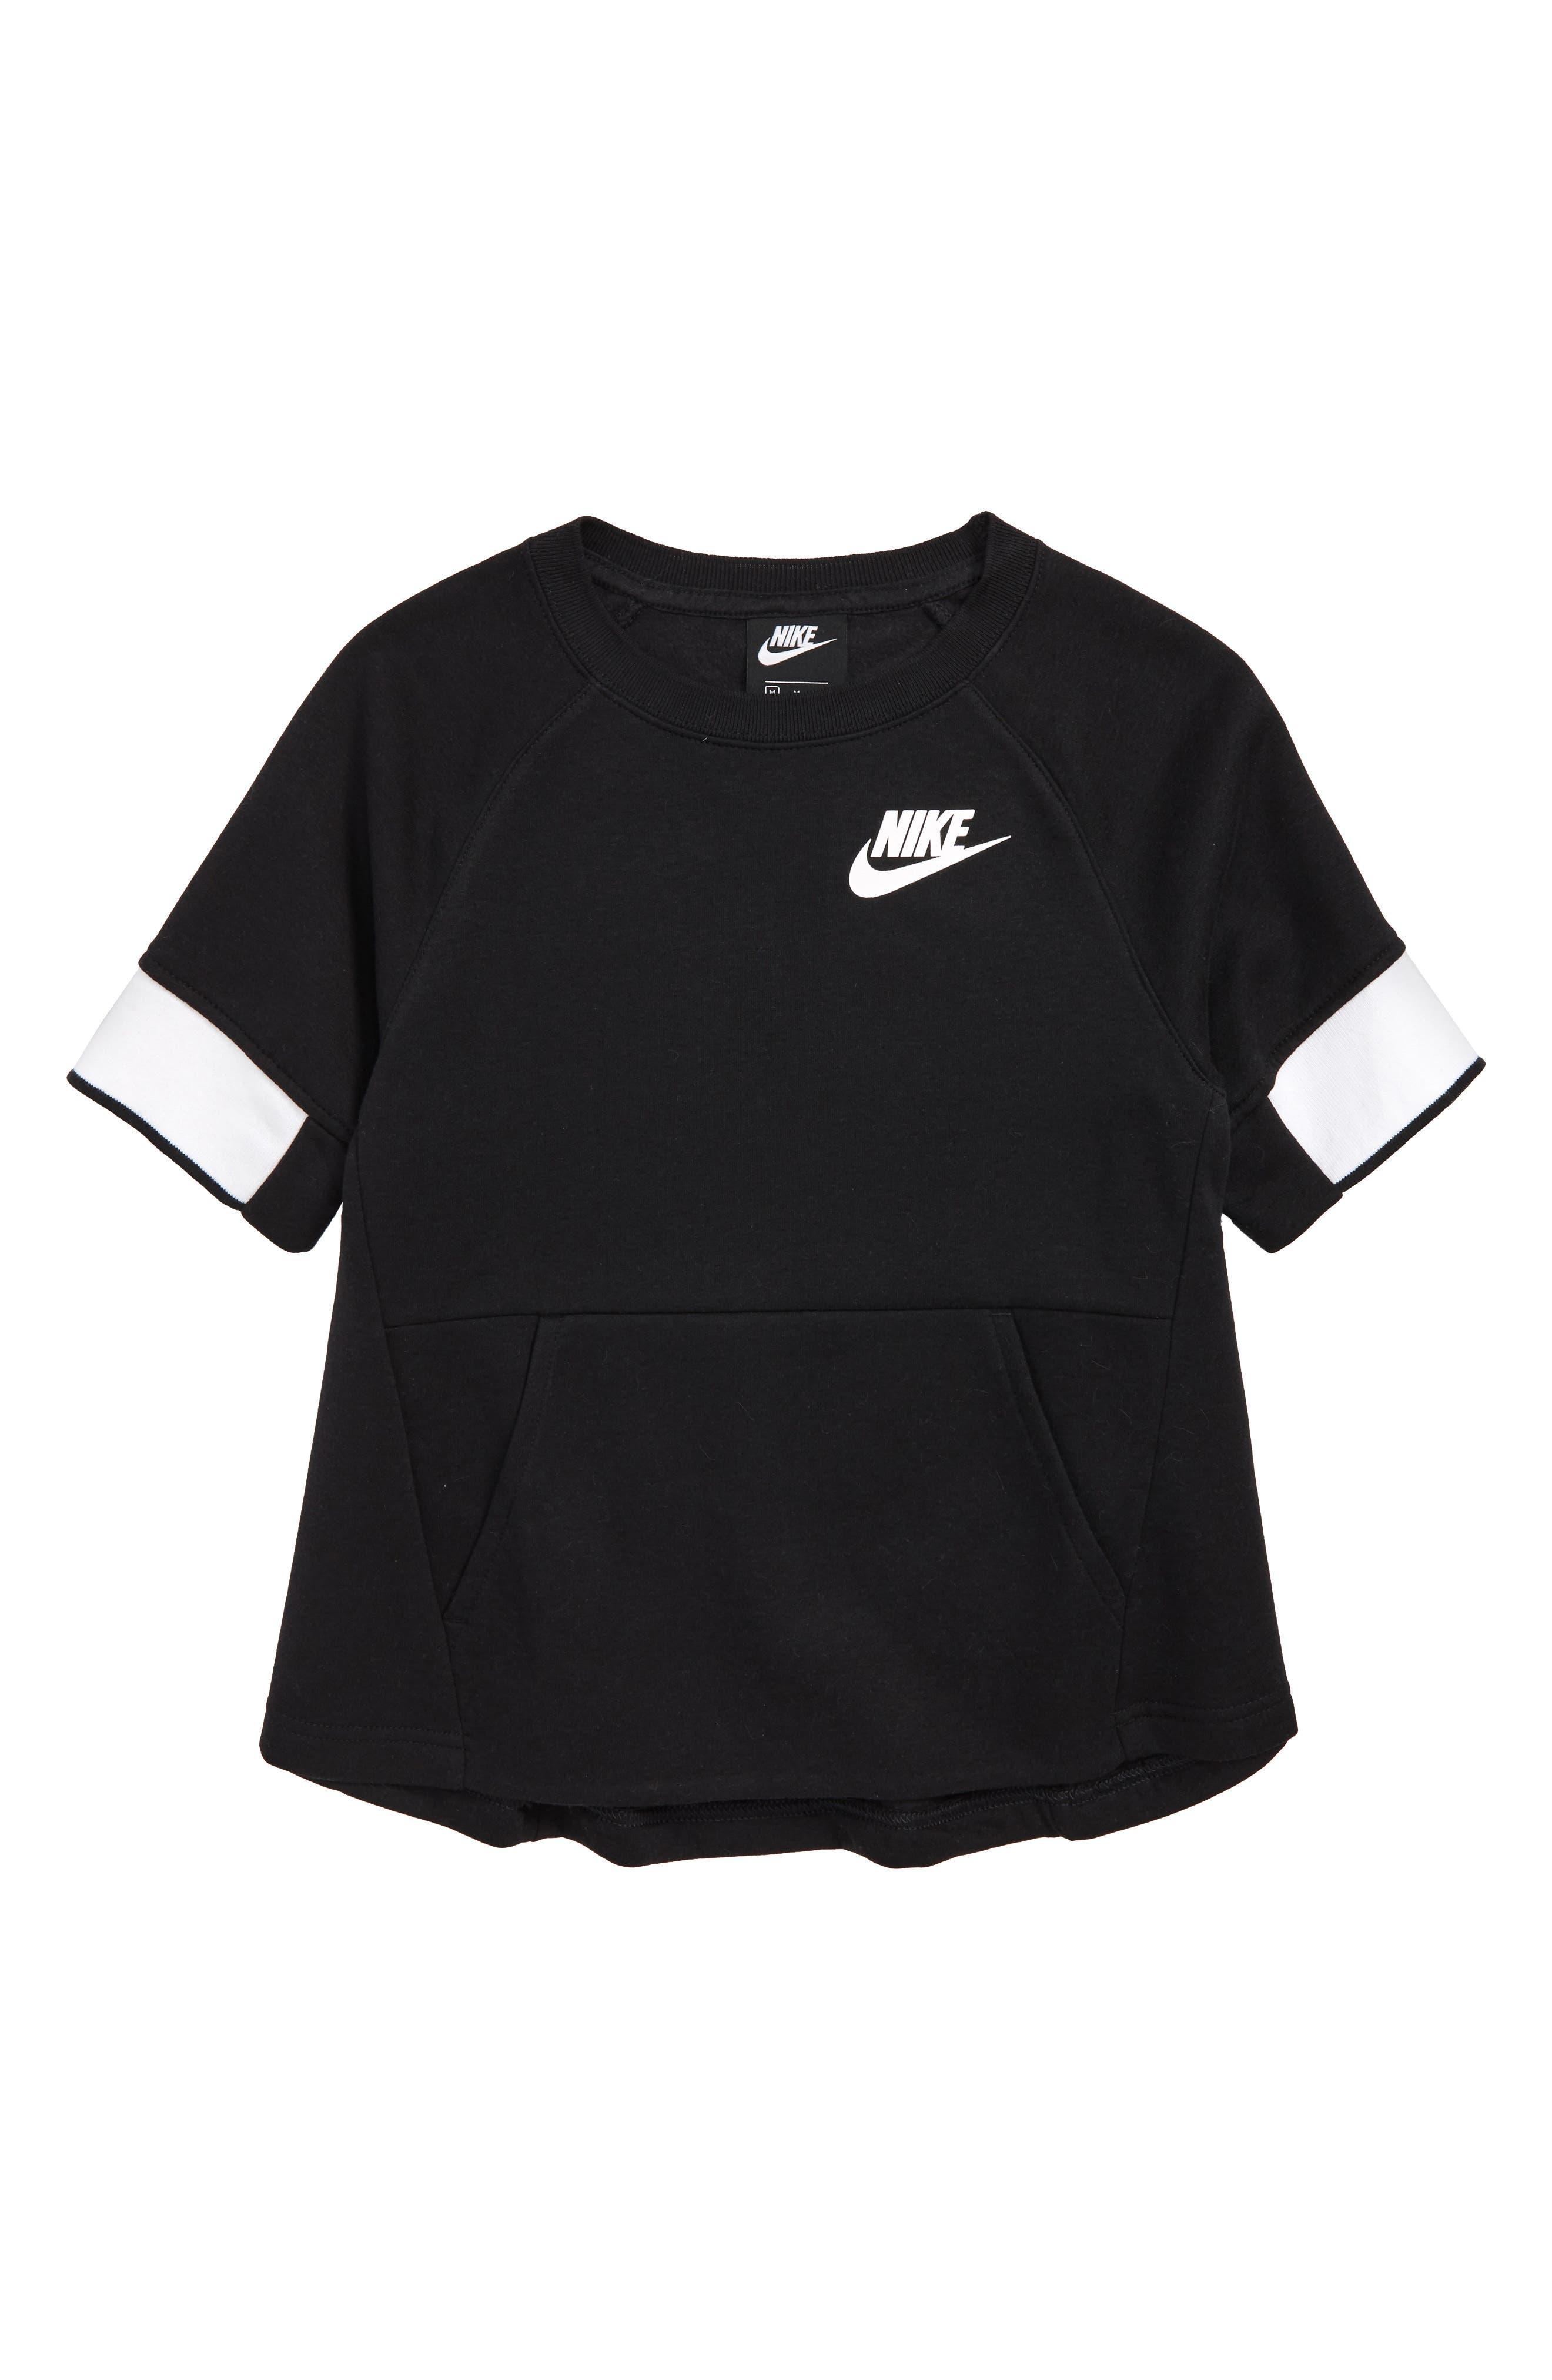 Sportswear Crewneck Pullover,                             Main thumbnail 1, color,                             BLACK/ WHITE